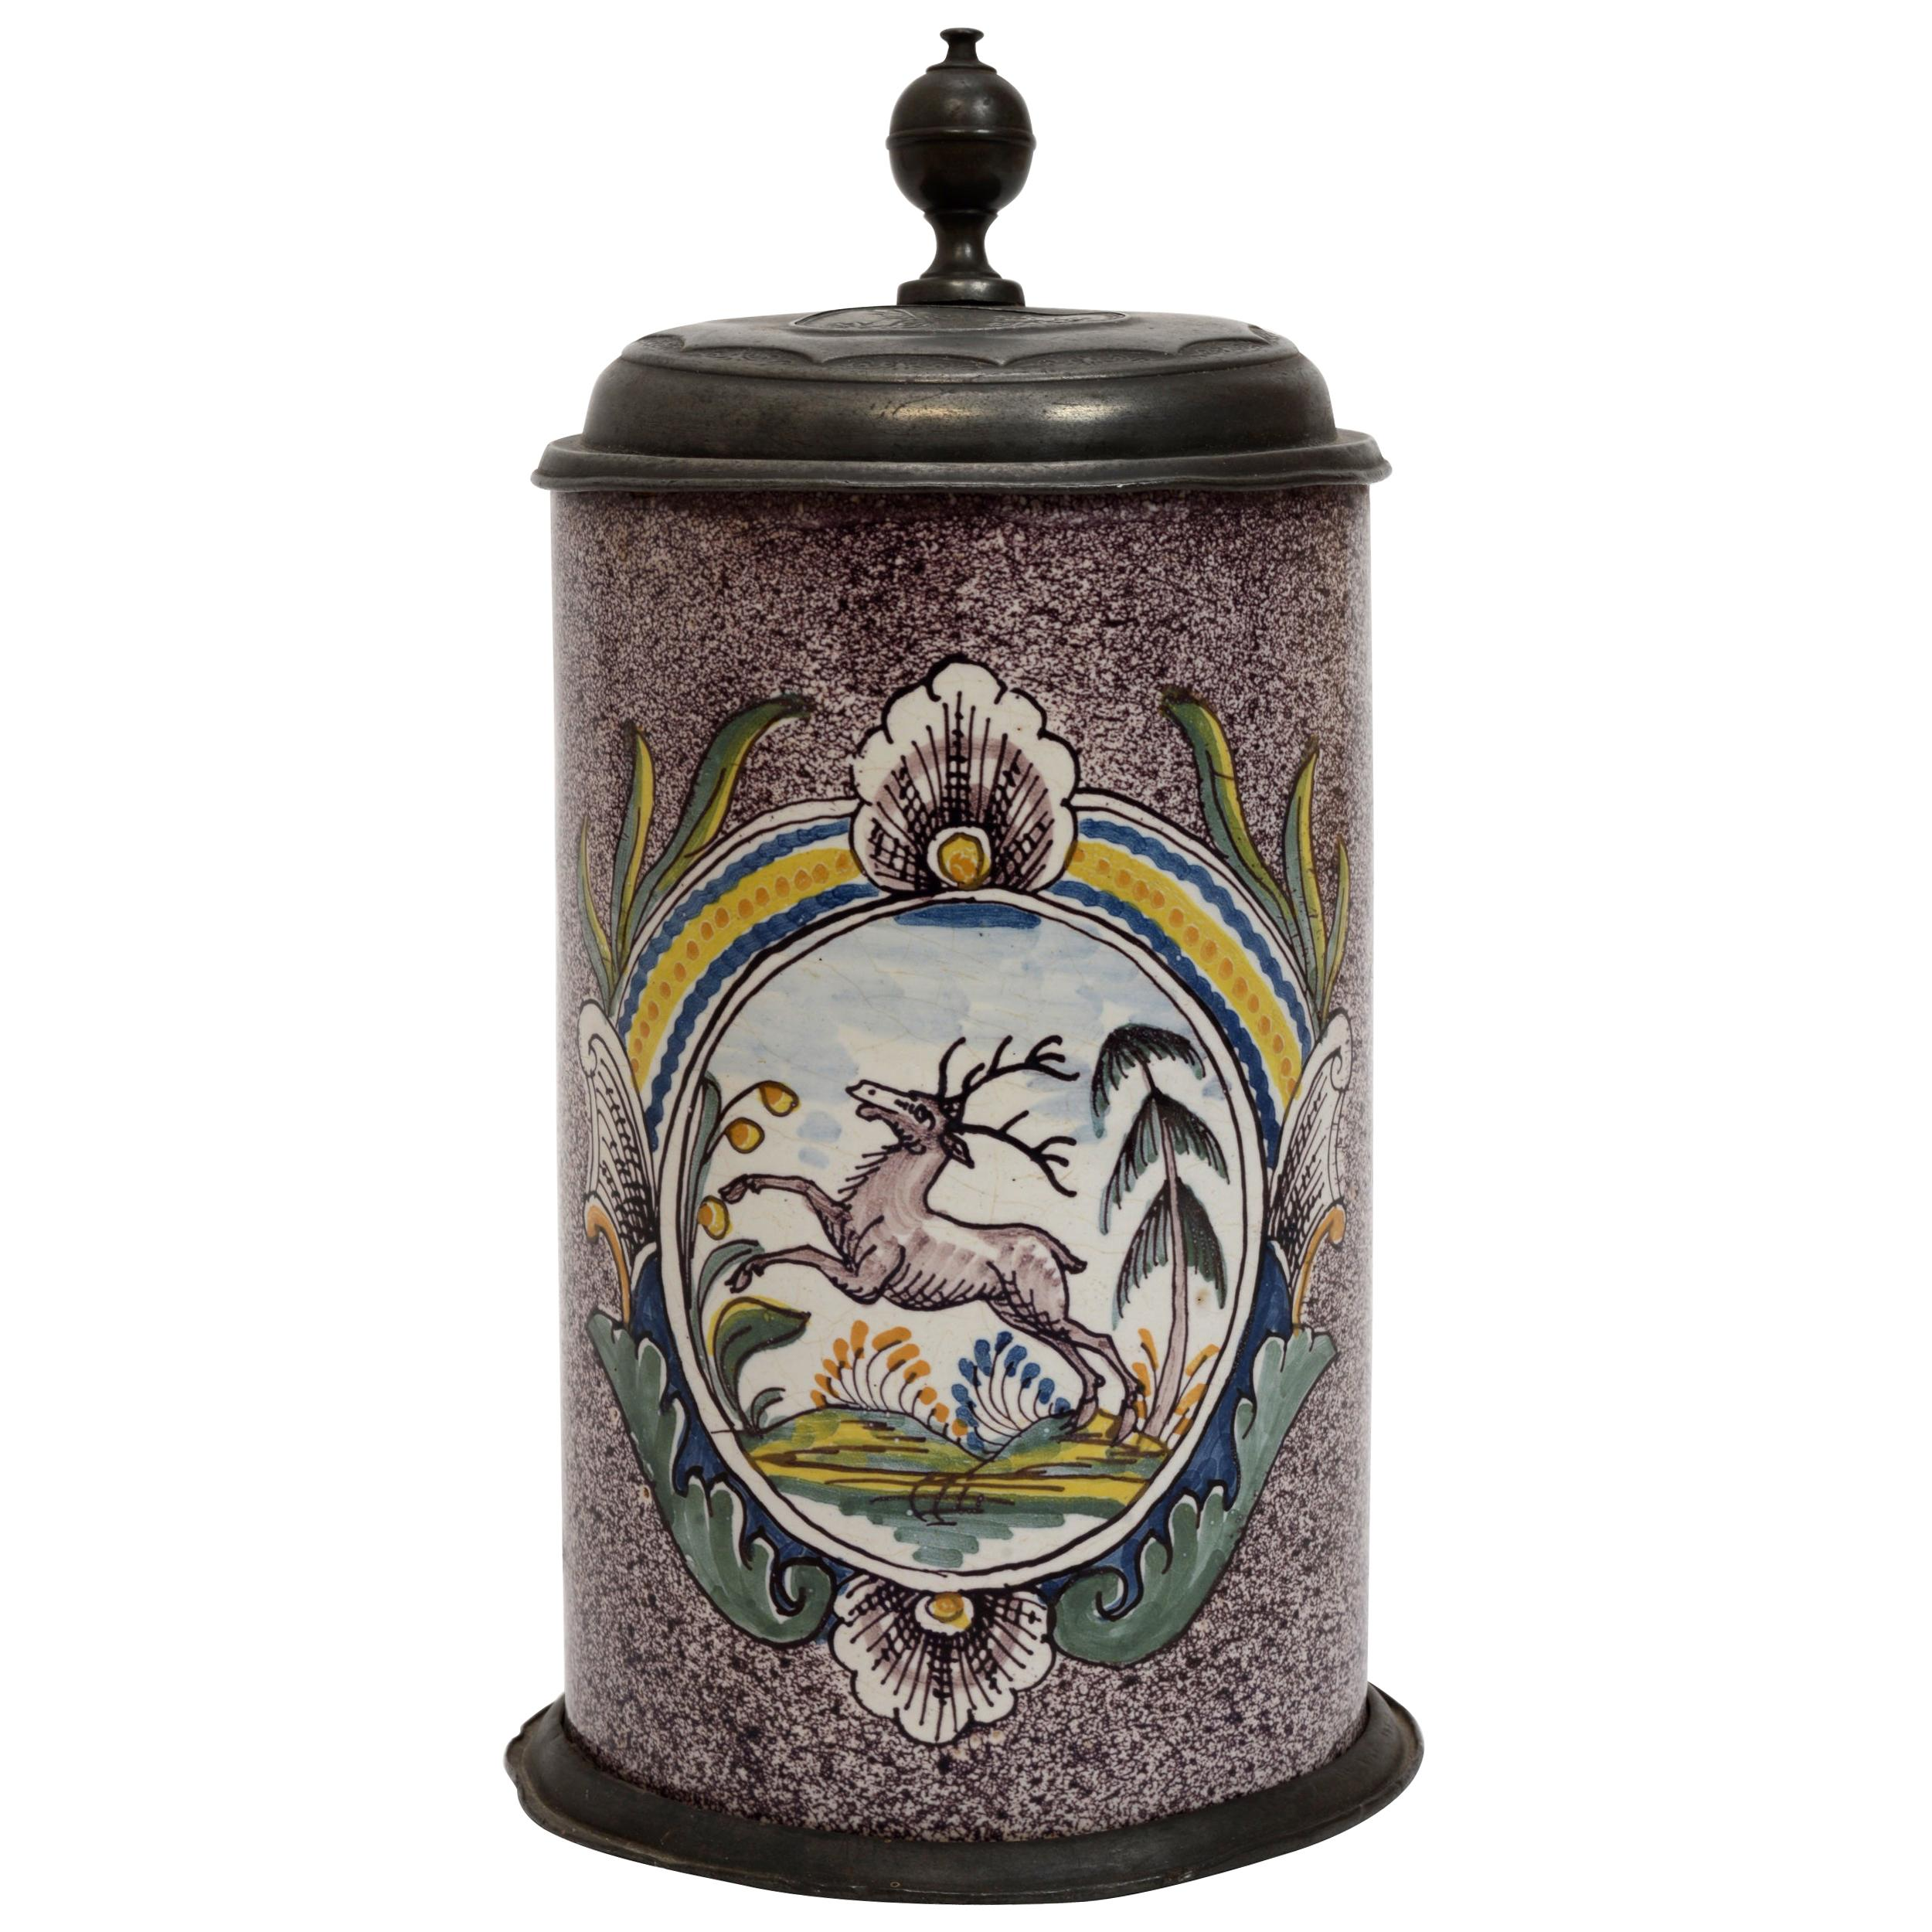 18th Century German Berlin Factory Pewter Mounted Spatterware Faience Stein